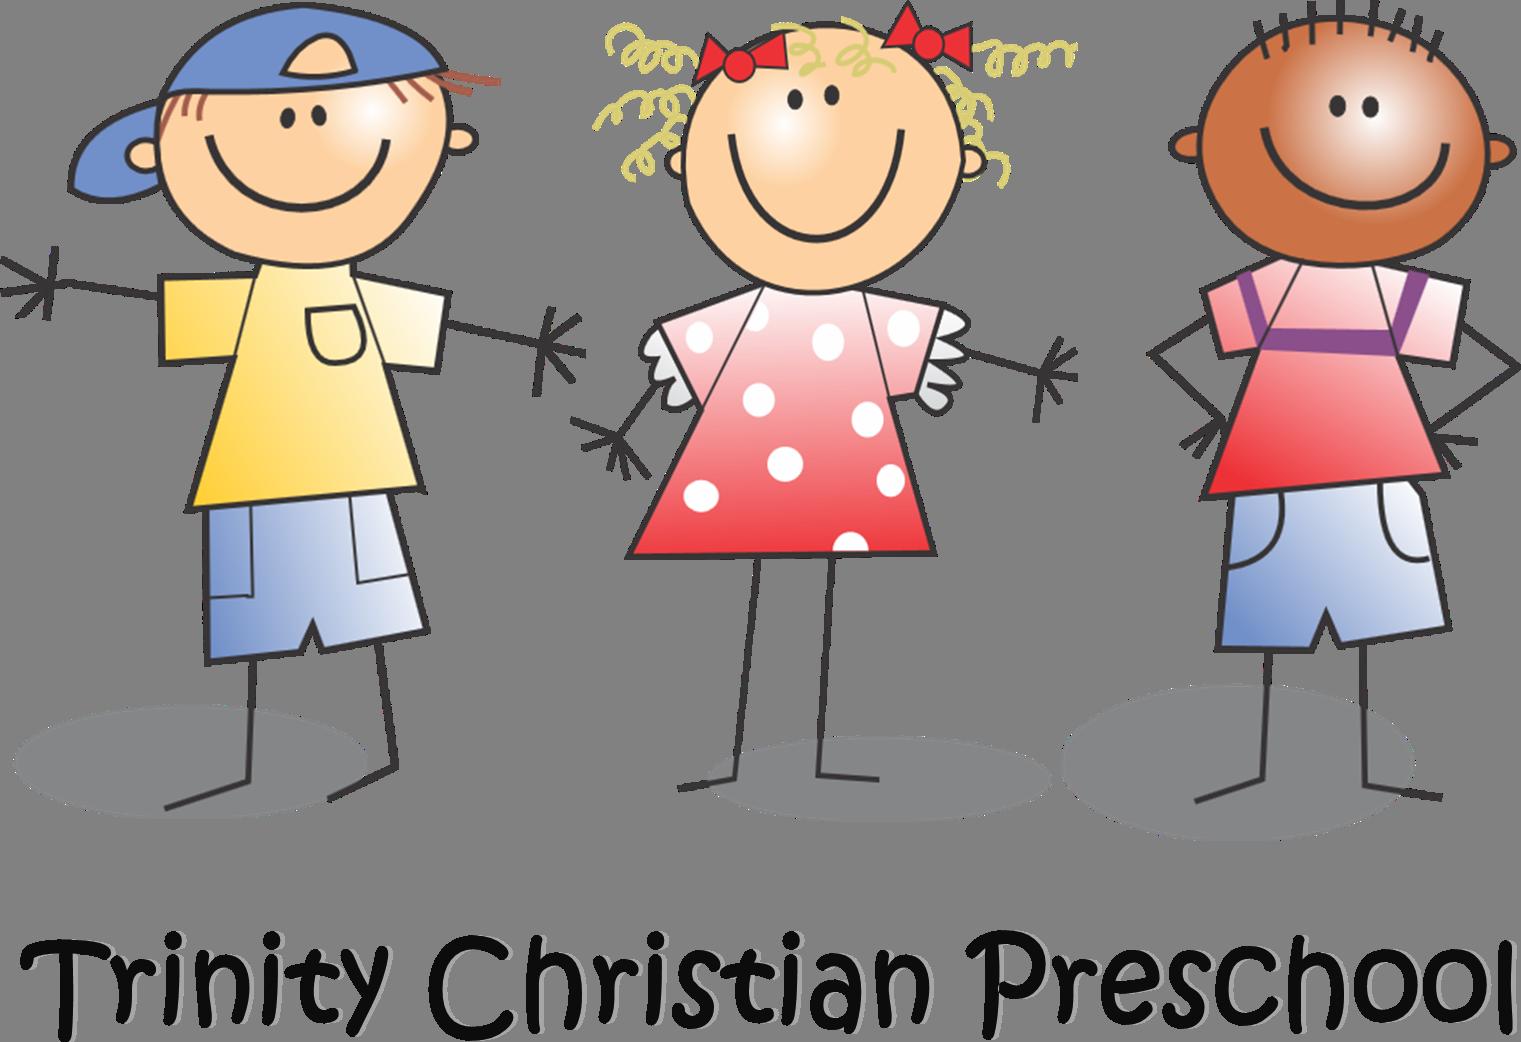 Pre school children clipart banner royalty free stock Dear Prospective Preschool Parents | Trinity Christian School banner royalty free stock